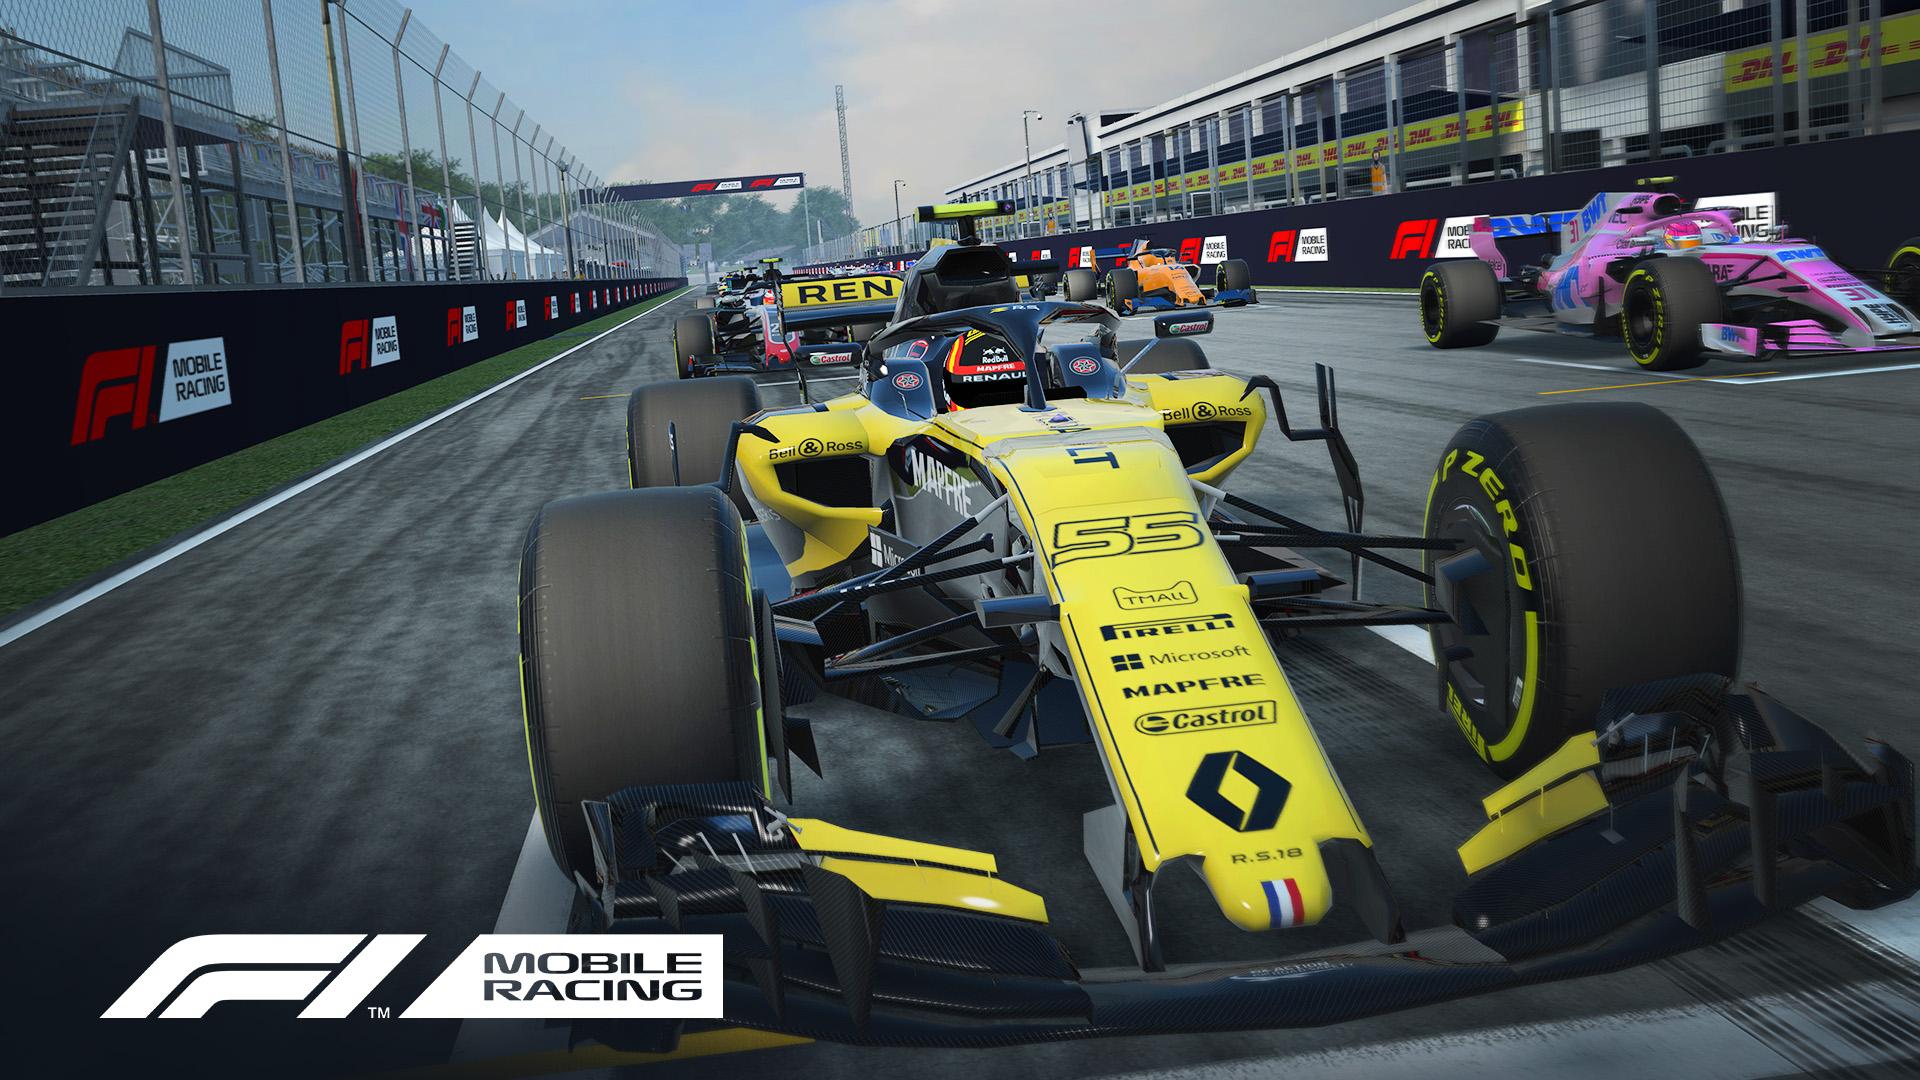 F1 Mobile Racing.jpg